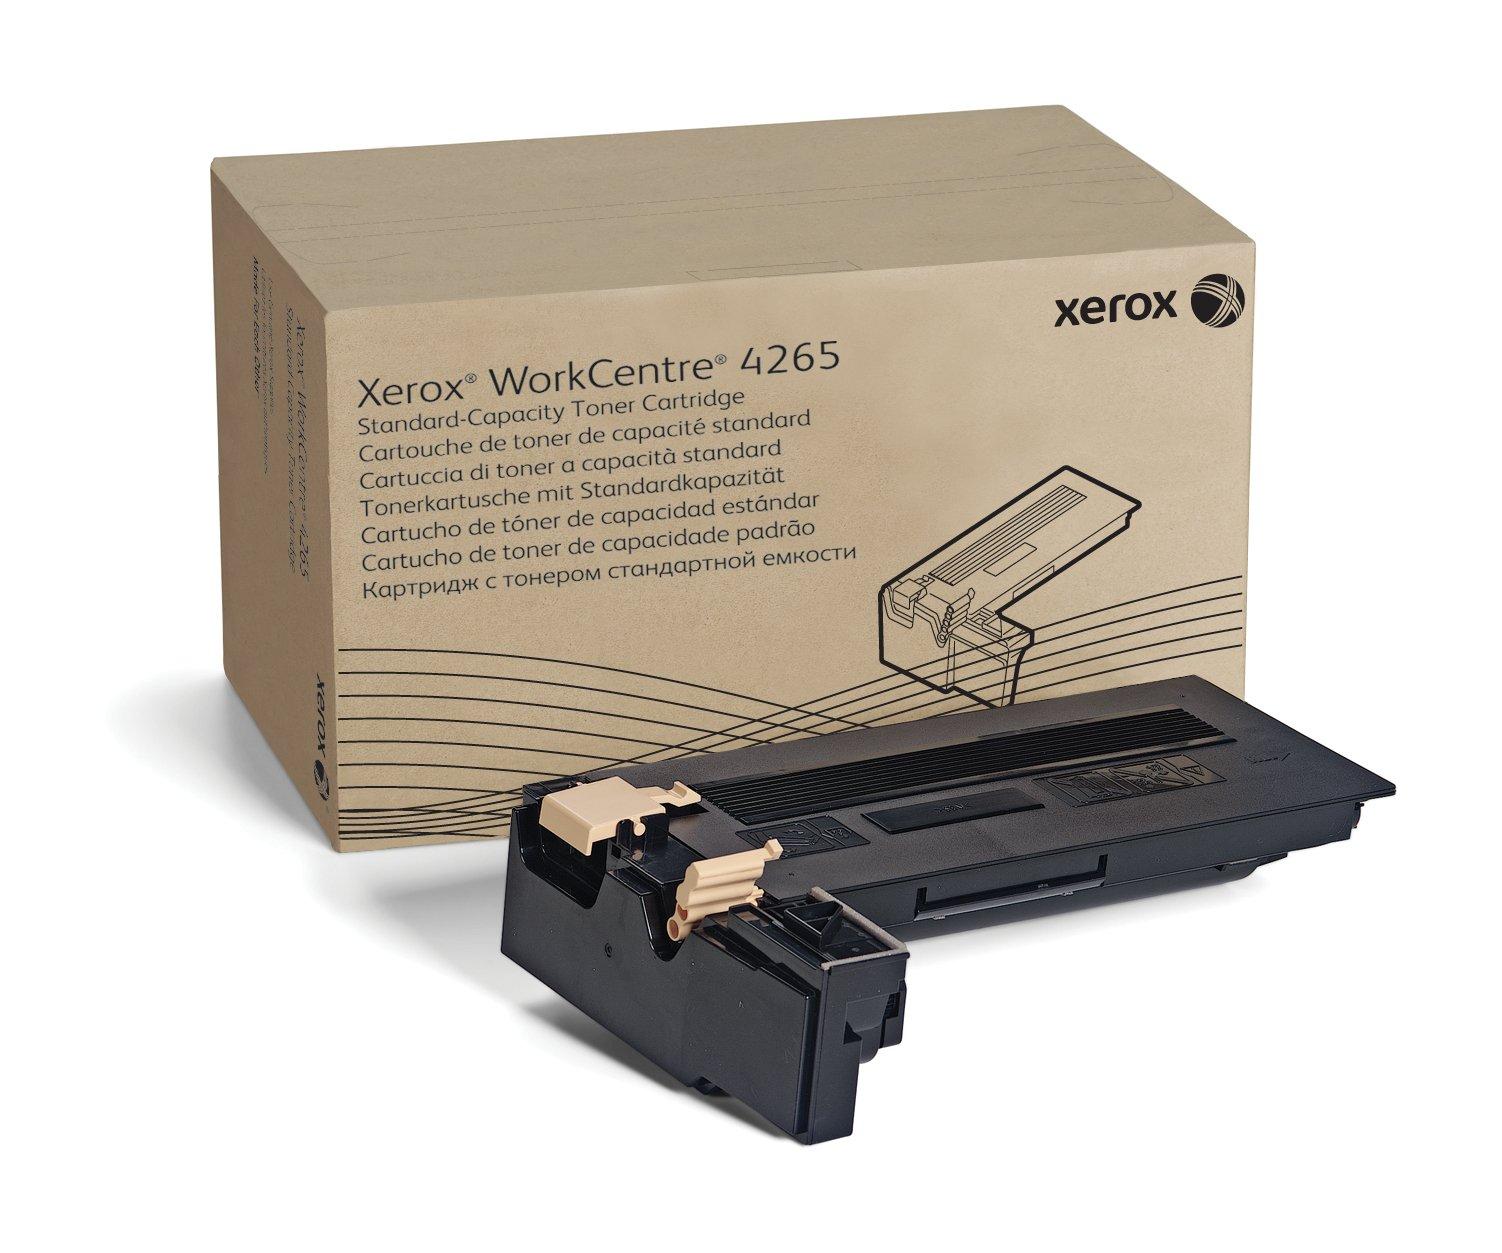 Toner Original XEROX Black para the WorkCentre 4265 106R03104